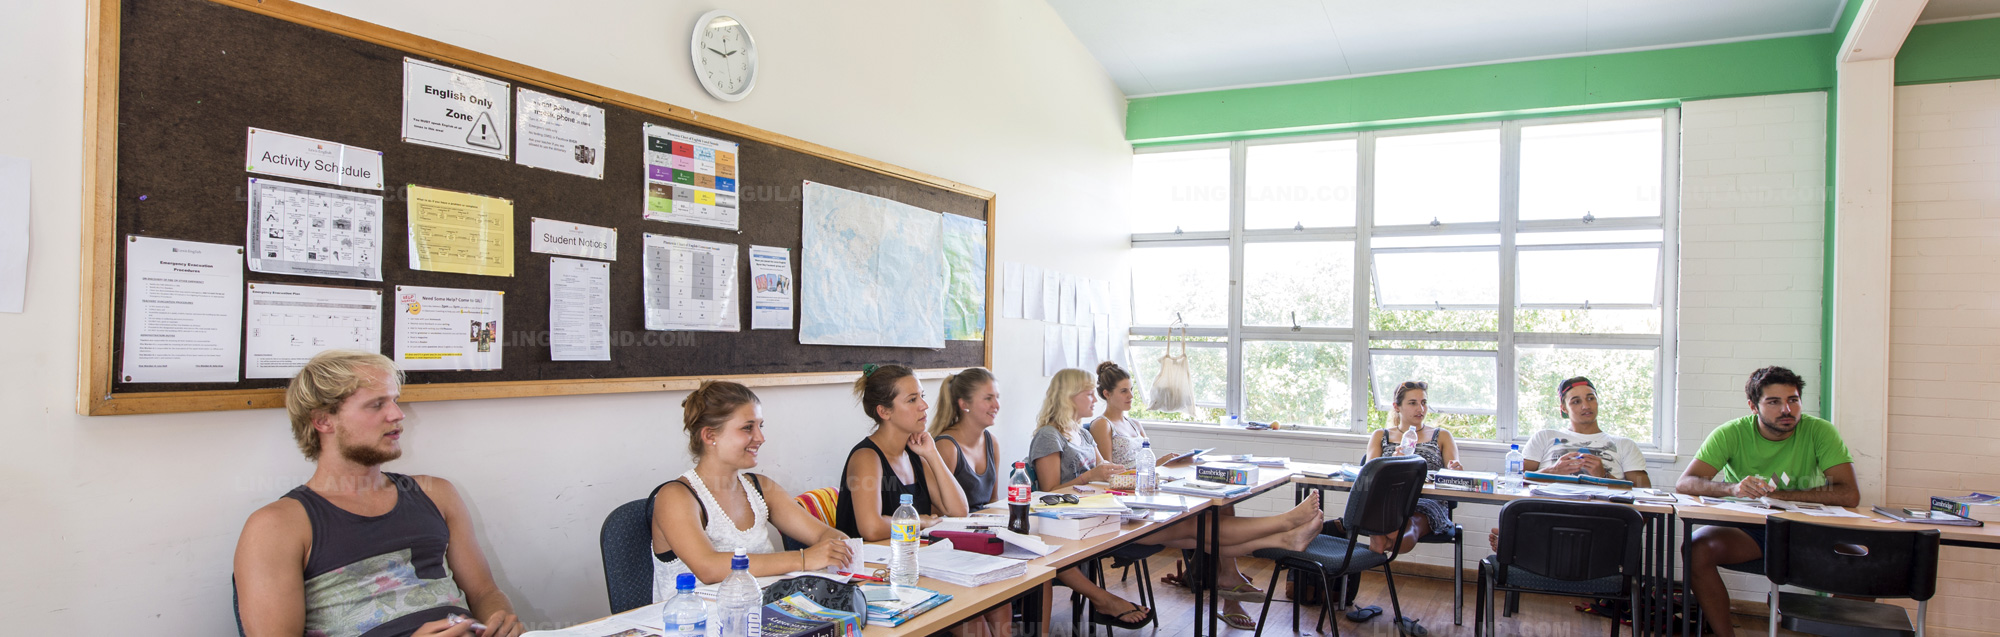 Sprachschule Lexis Byron Bay